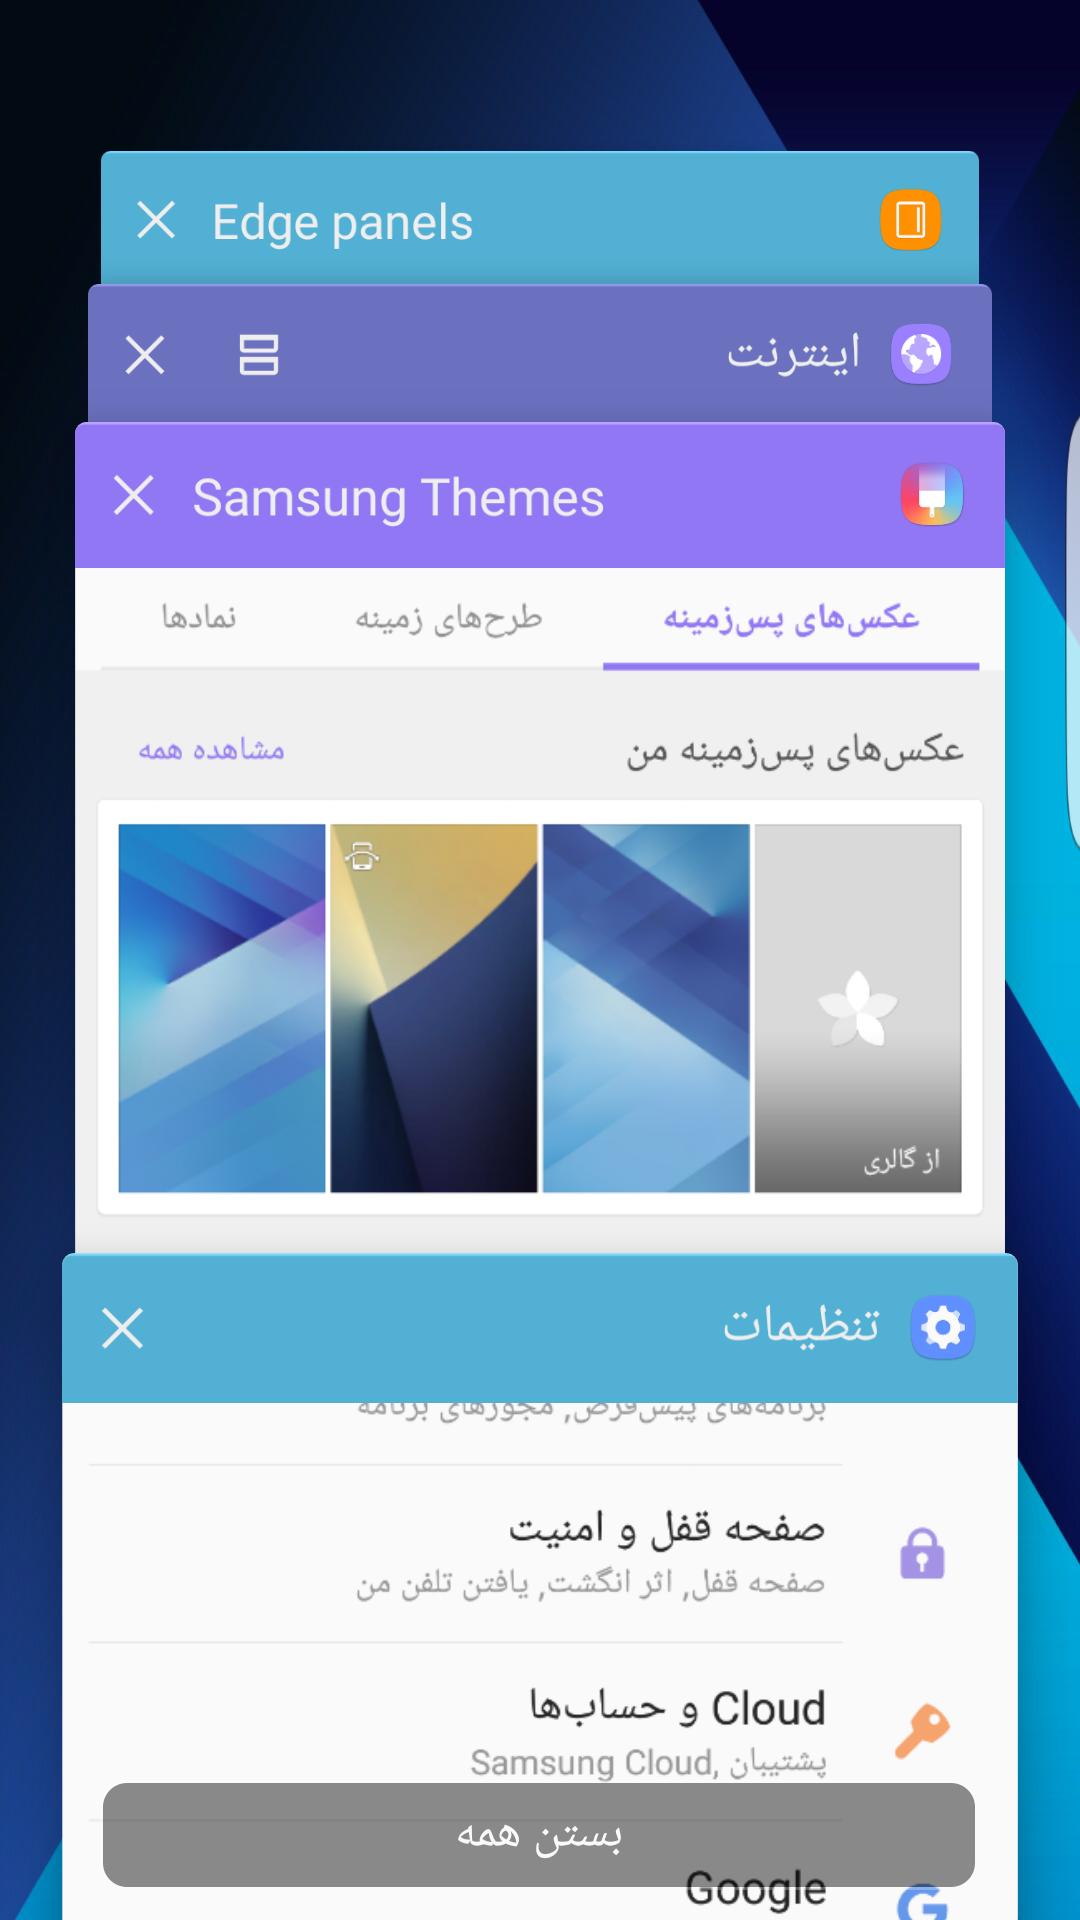 Screenshot_۲۰۱۷۰۳۰۵-۱۱۴۳۴۳